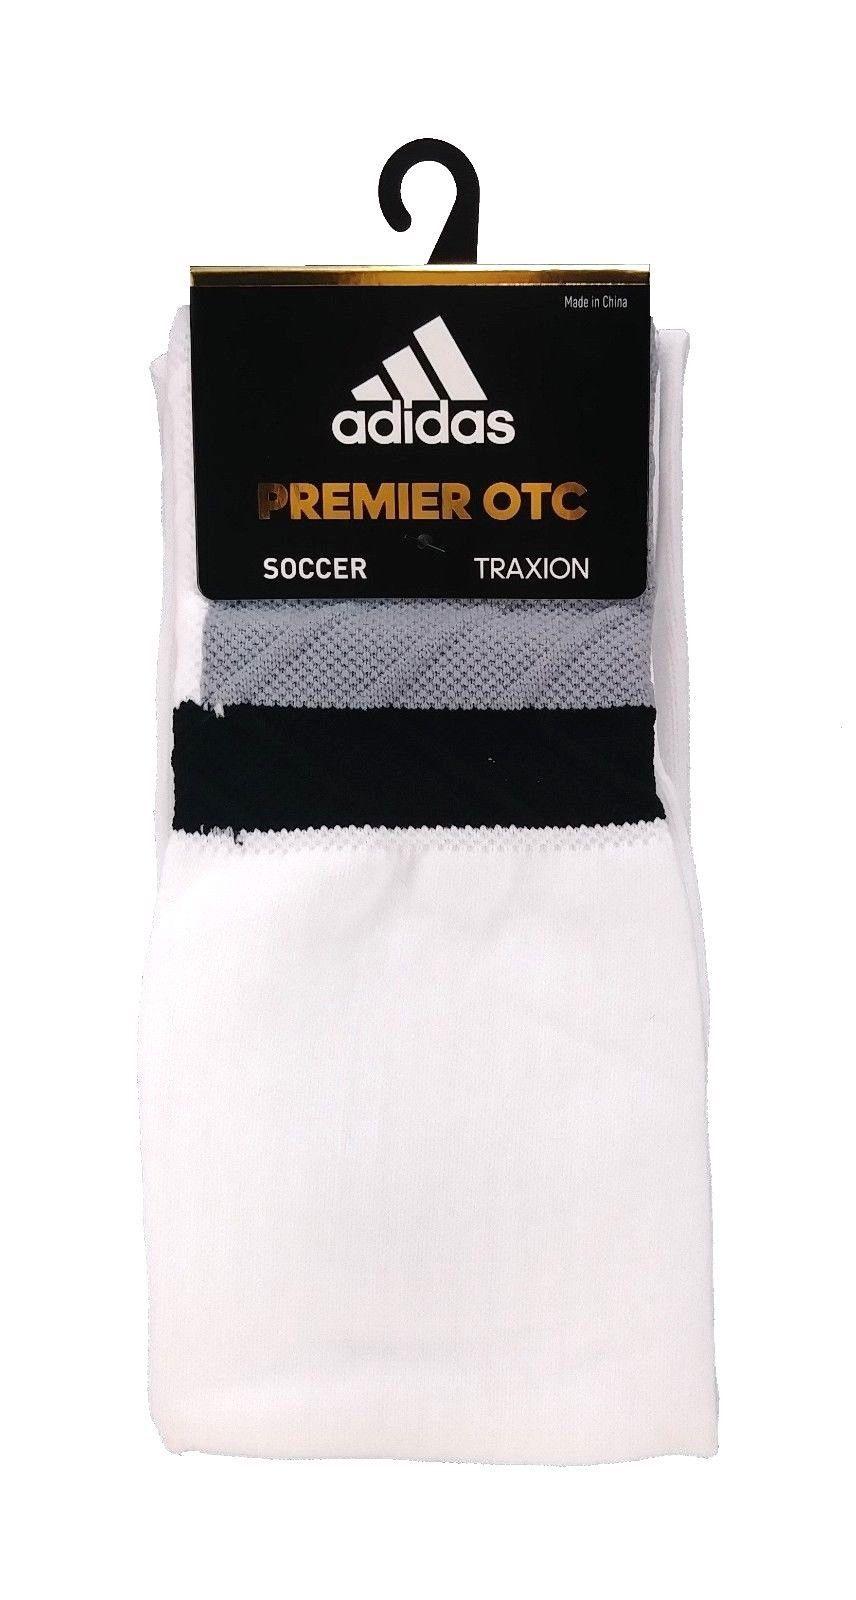 ADIDAS Climalite Traxion Premier OTC Socks sz S Small (13C-4Y) White - $19.99